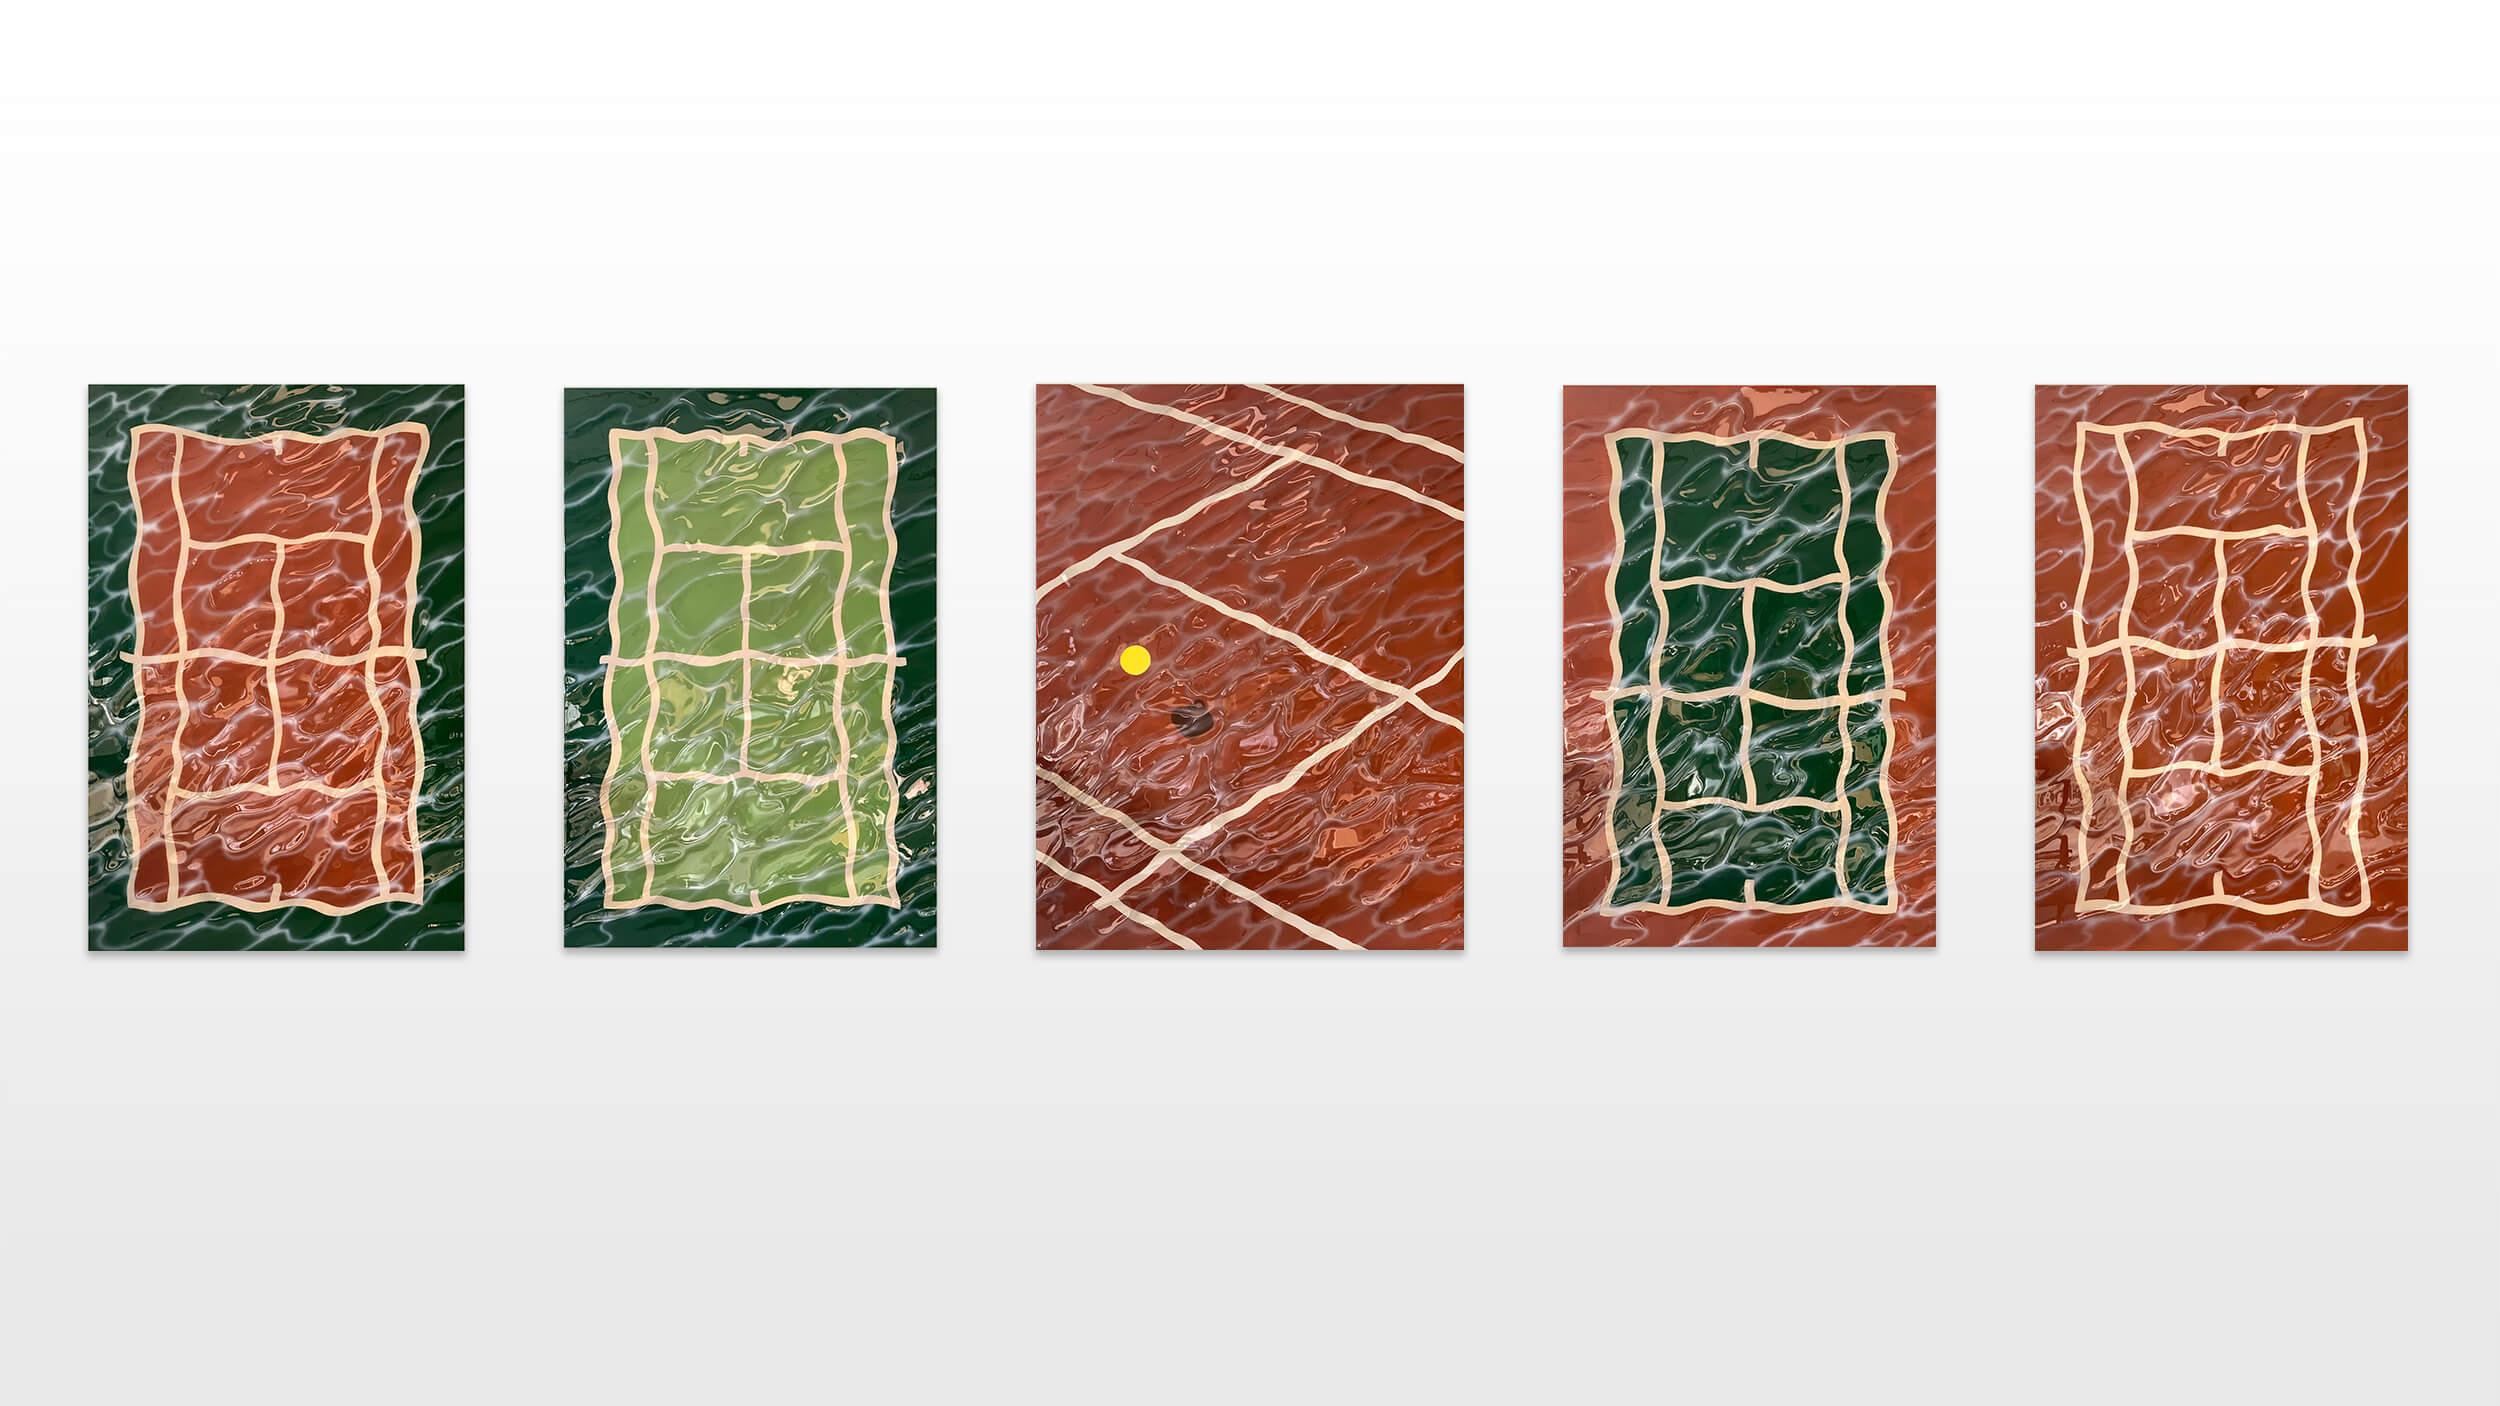 Toiles de l'artiste Guillaume Gerando Alias SupaKitch